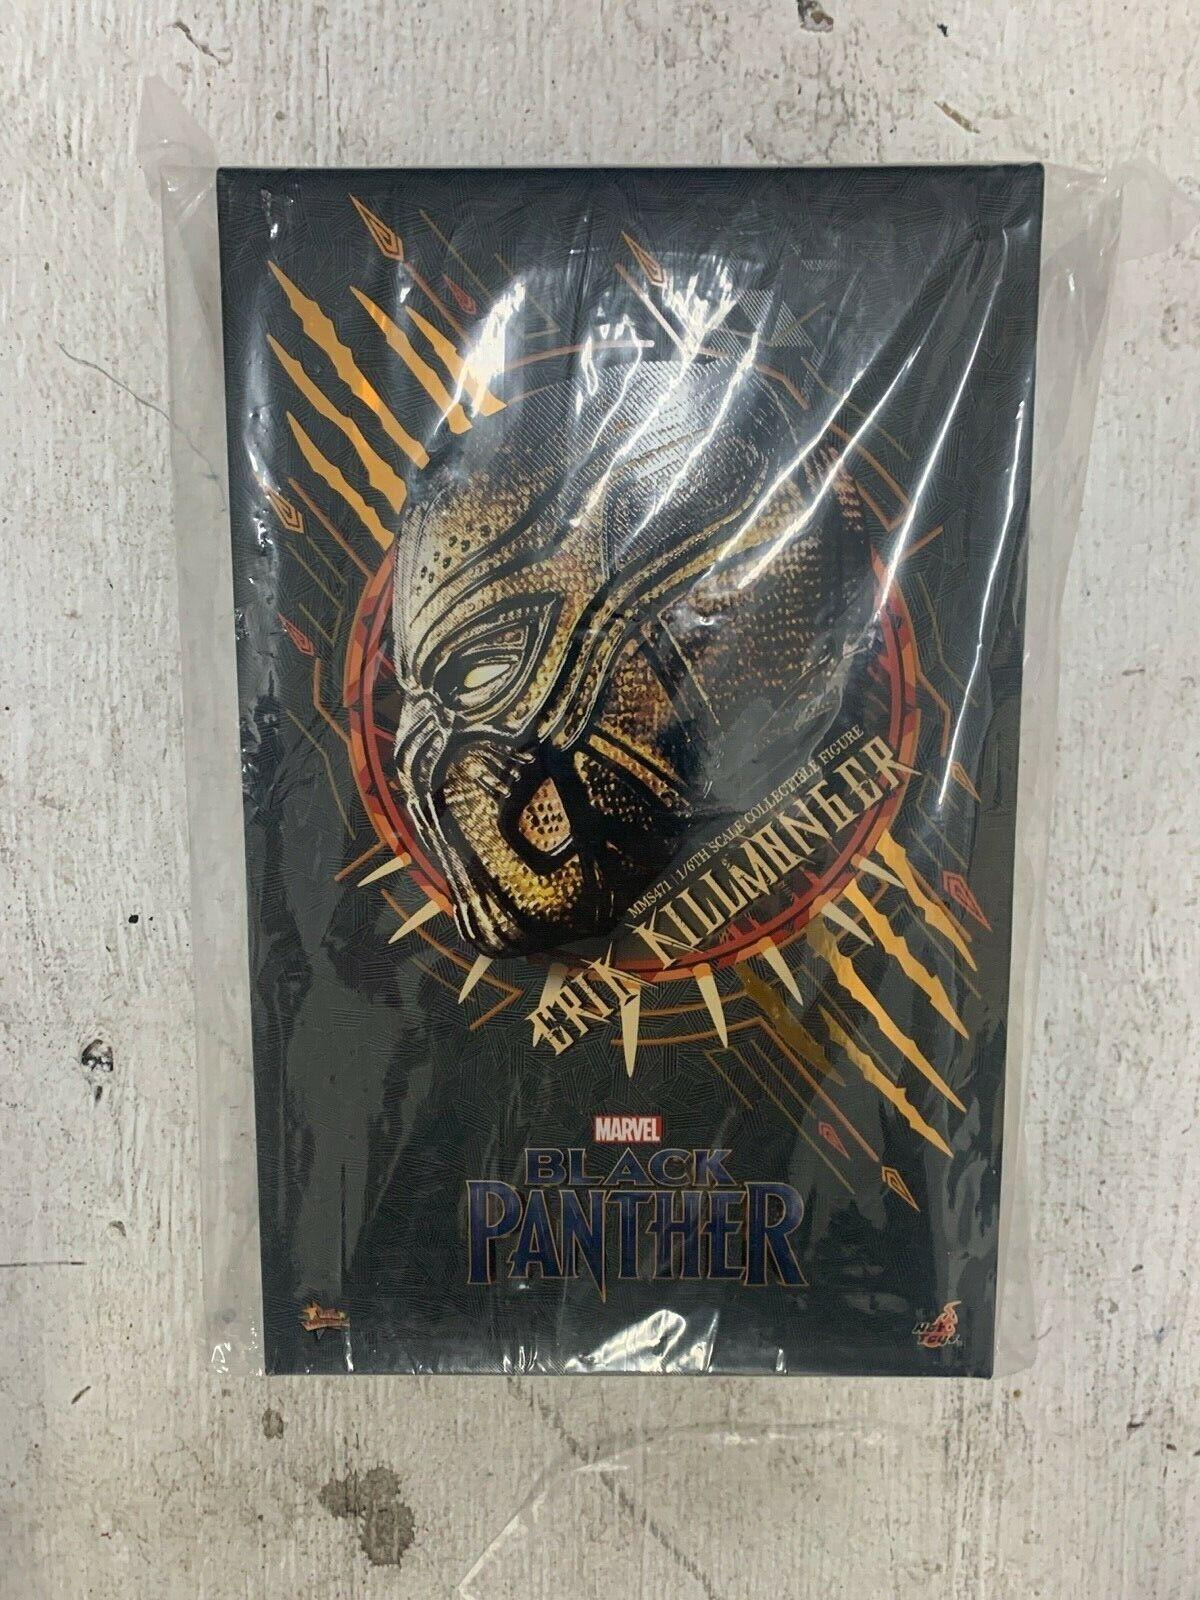 Marvel Hot Toys KILLMONGER Black Panther MMS 471 1/6 Avengers NO RESERVE wakanda on eBay thumbnail